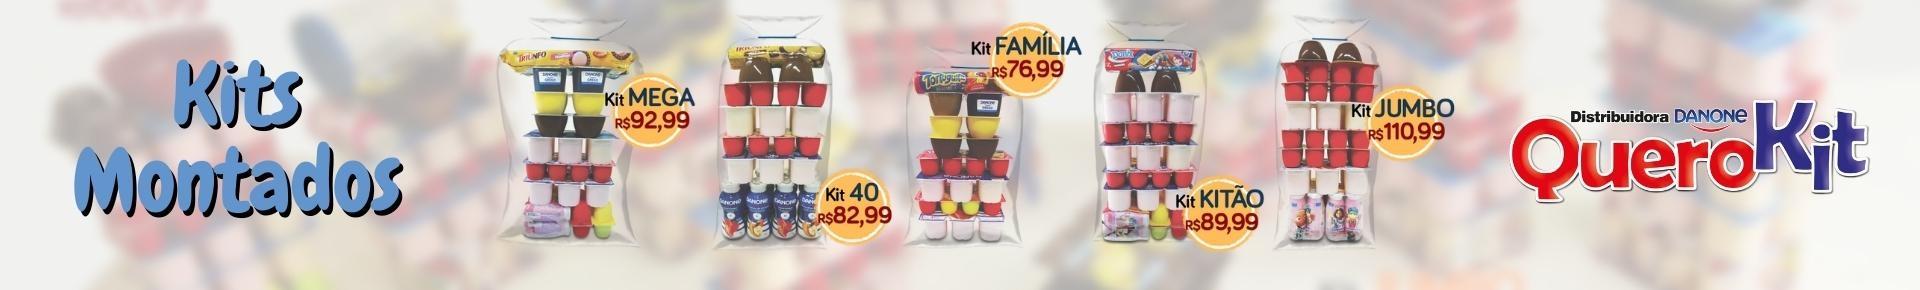 ACTIMEL, AUMENTA DUA IMUNIDADE